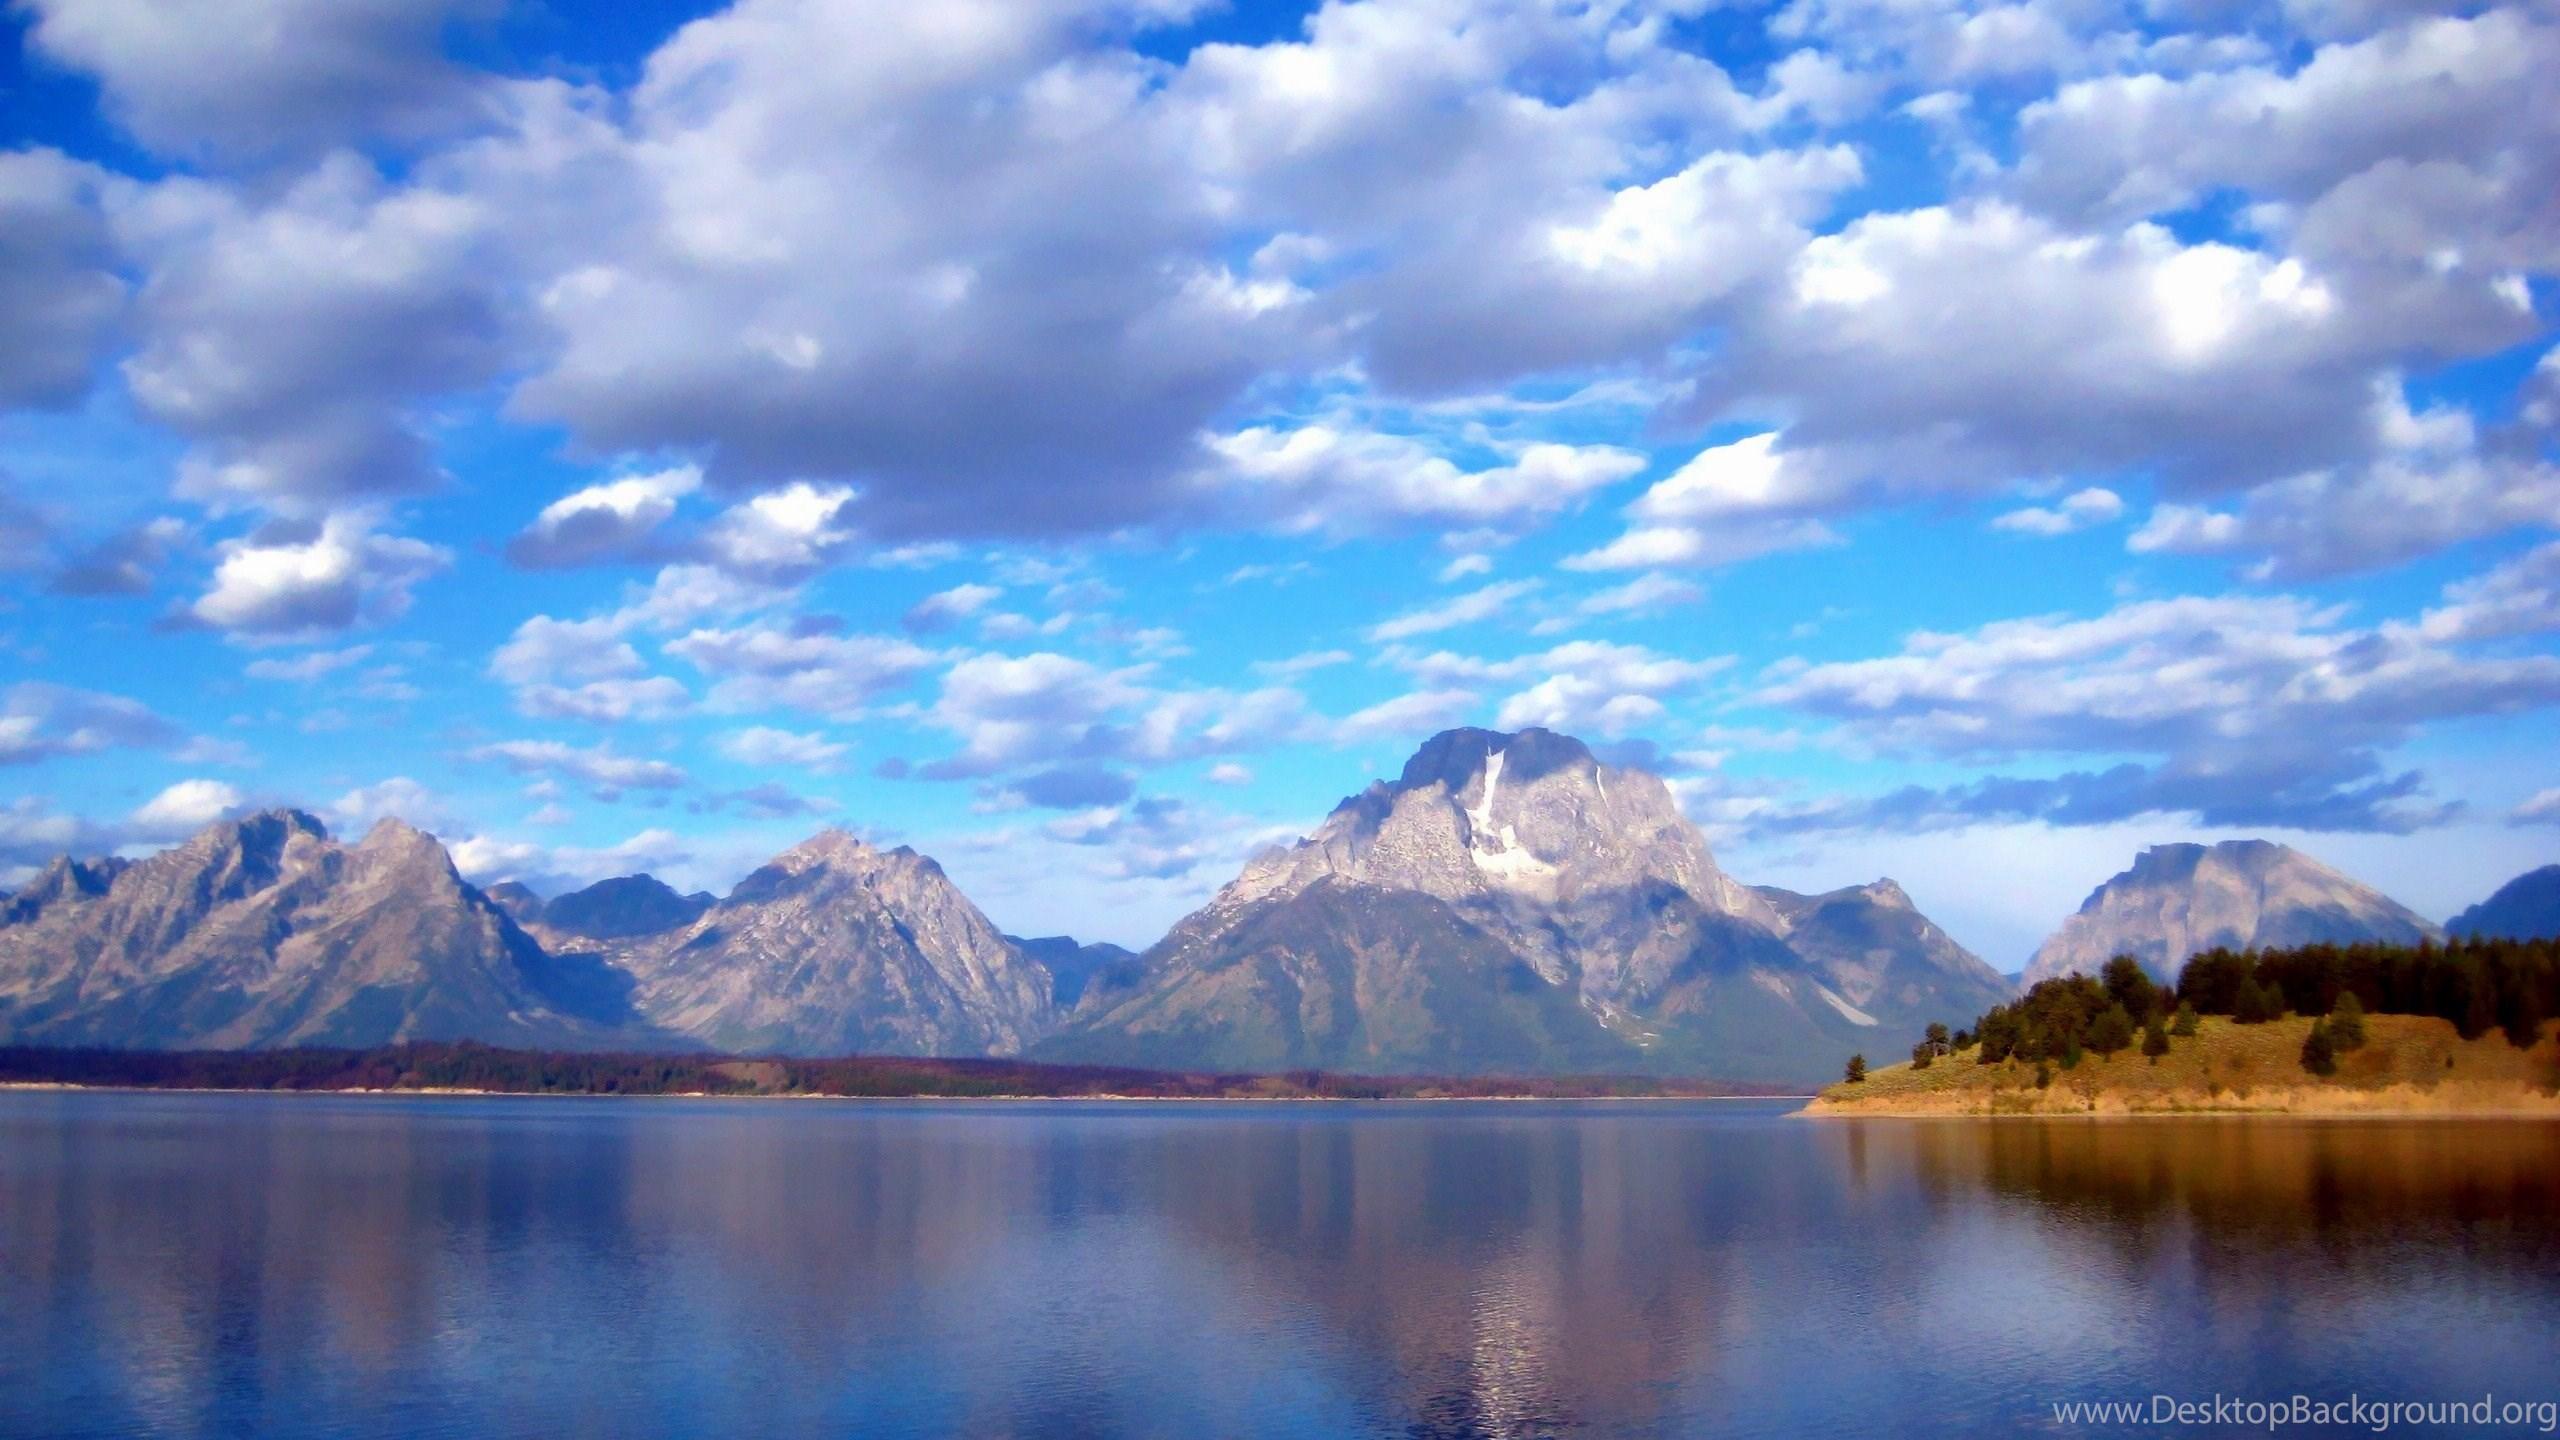 Wyoming Grand Teton National Park Wallpapers Desktop Background